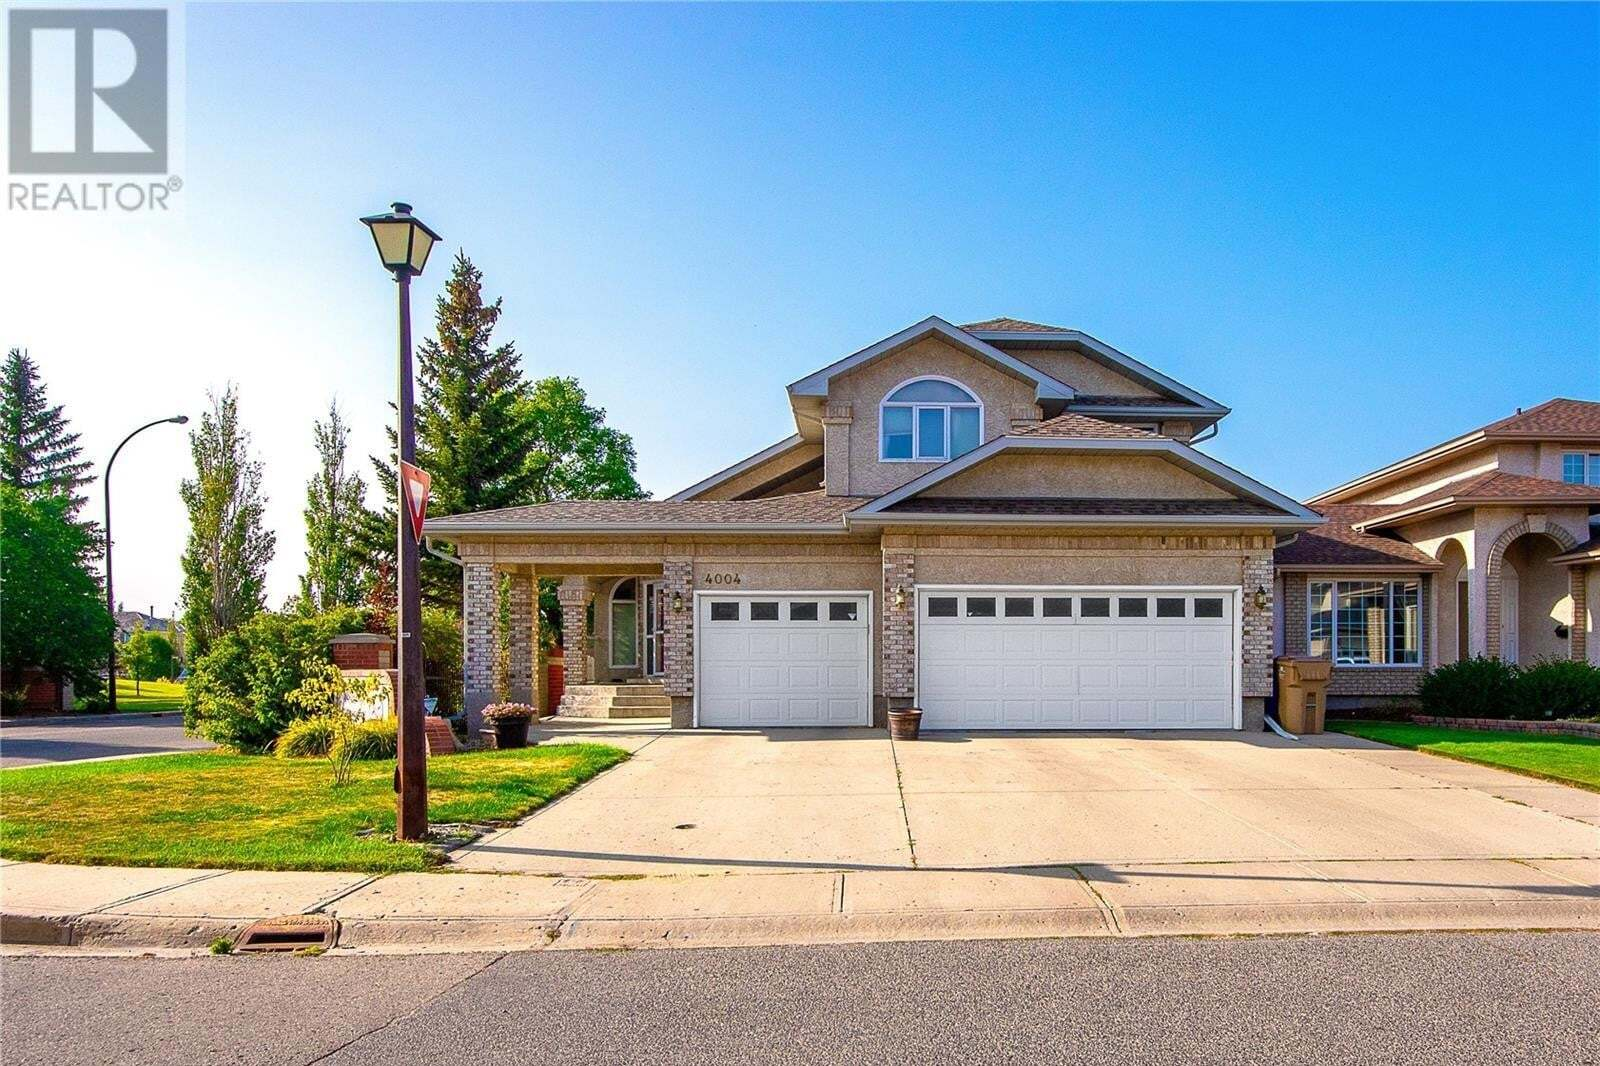 House for sale at 4004 Wascana Ridge By Regina Saskatchewan - MLS: SK827304